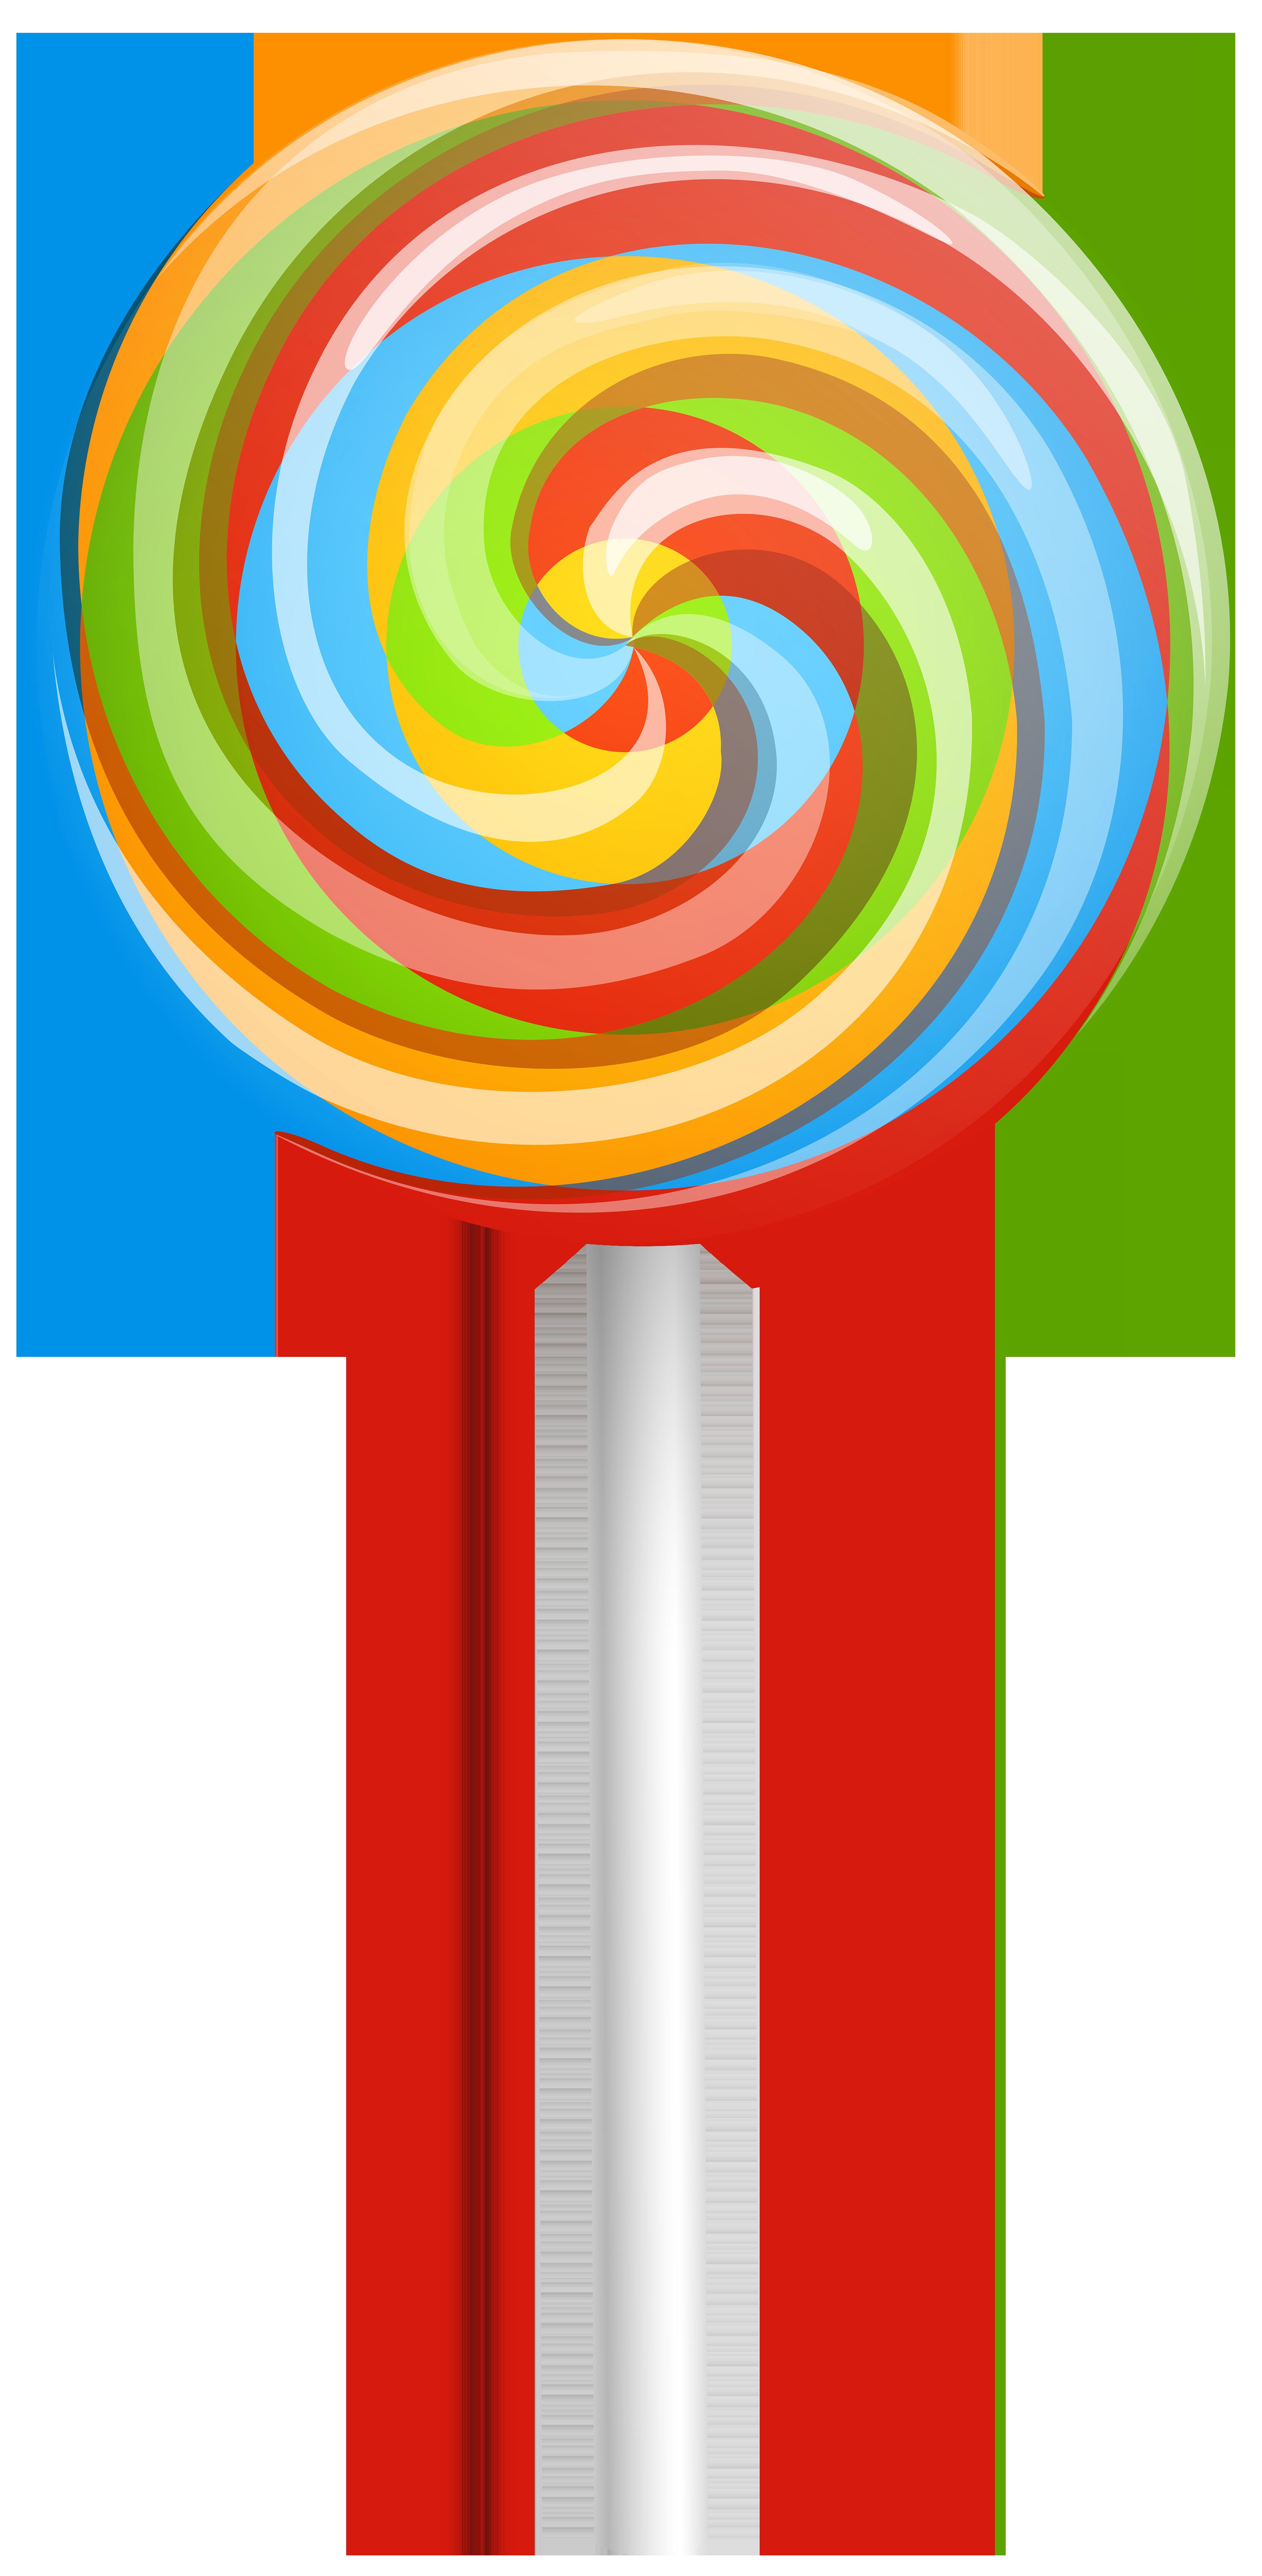 Heart clipart lollipop.  collection of rainbow